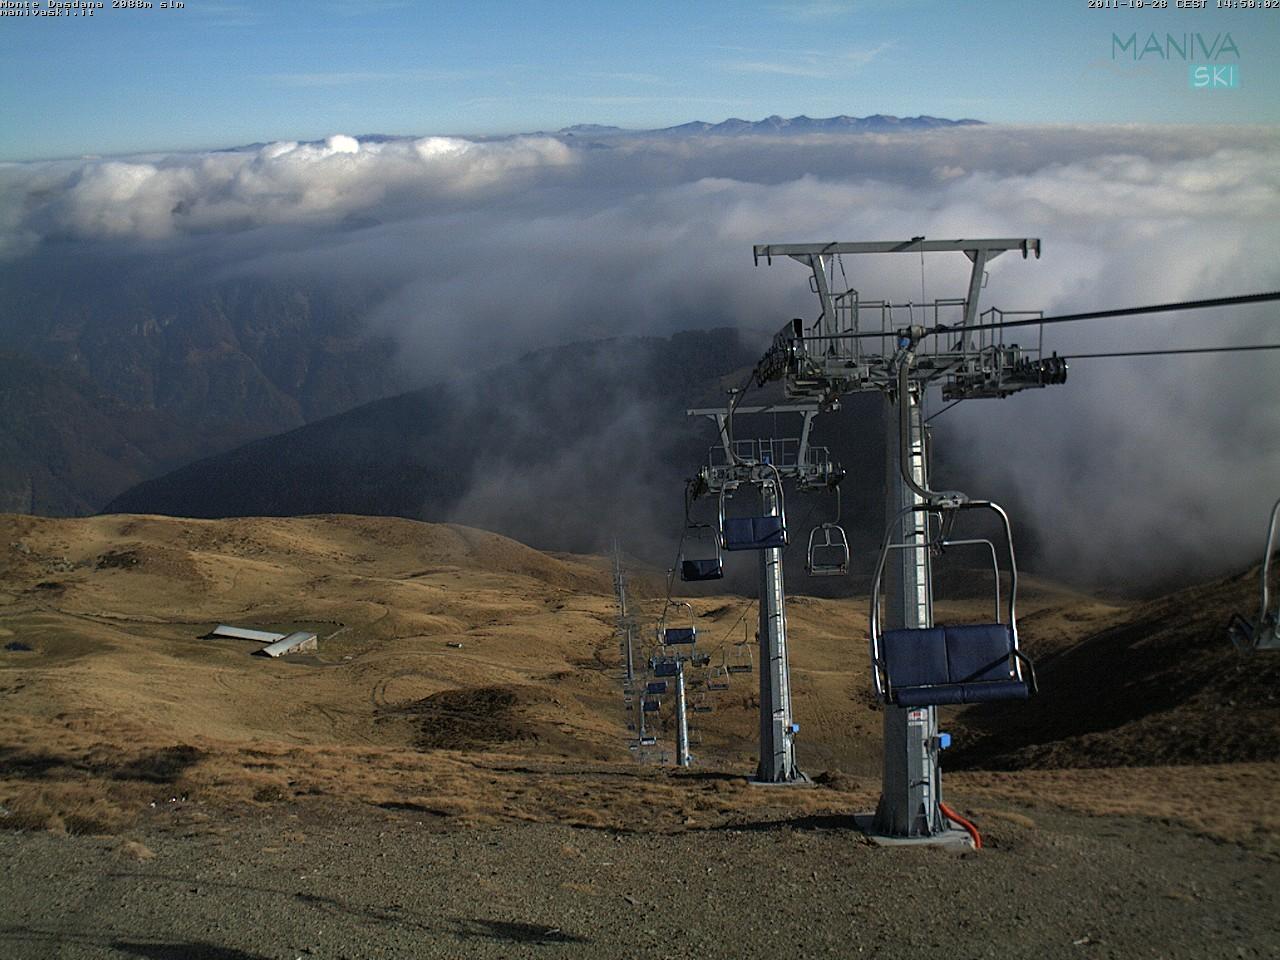 Monte Dasdana